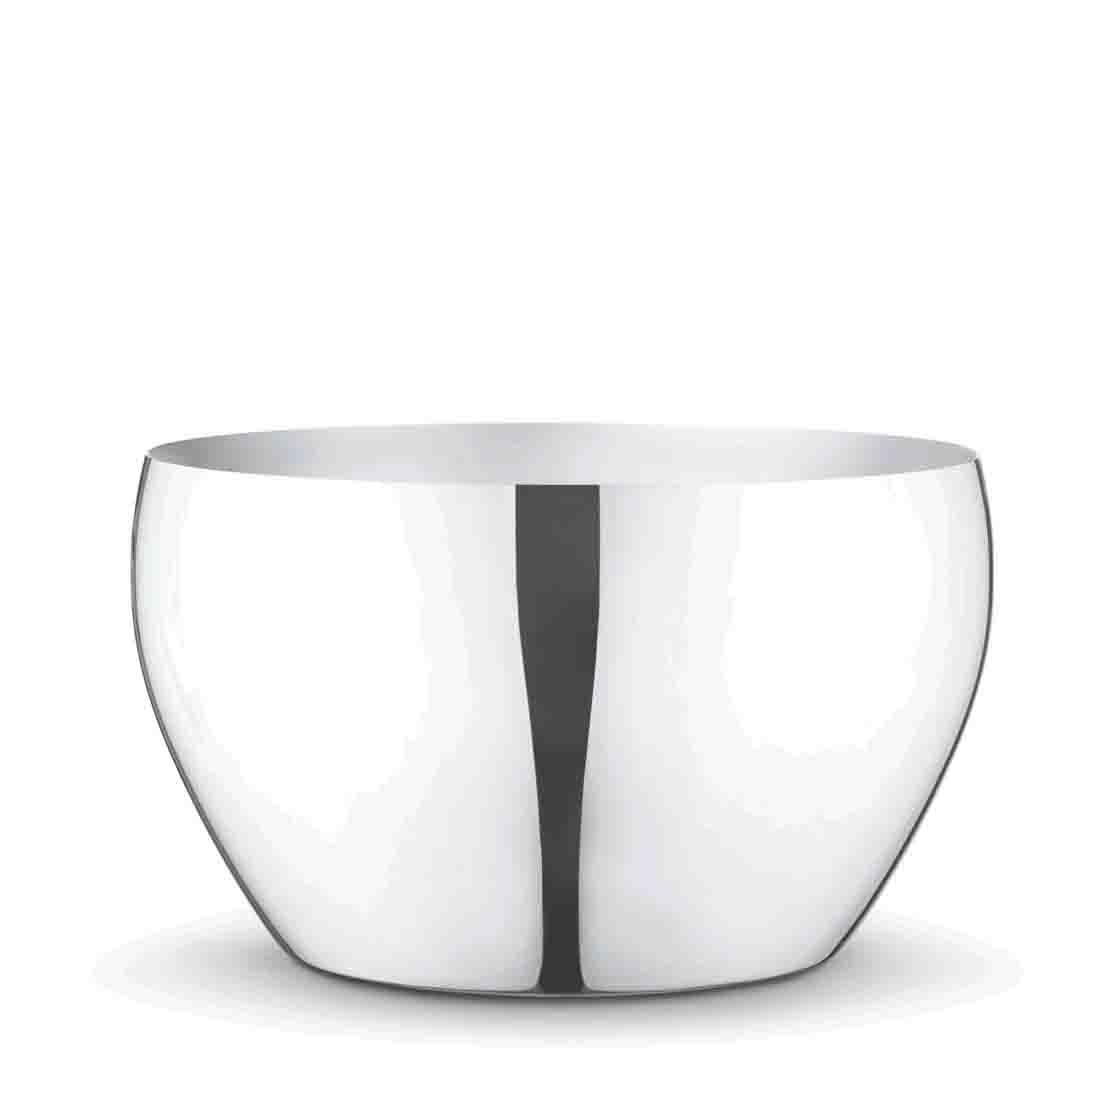 LIVING GEORG JENSEN CAFU系列 - 不鏽鋼置物皿(大型) 建議售價NT$6,400